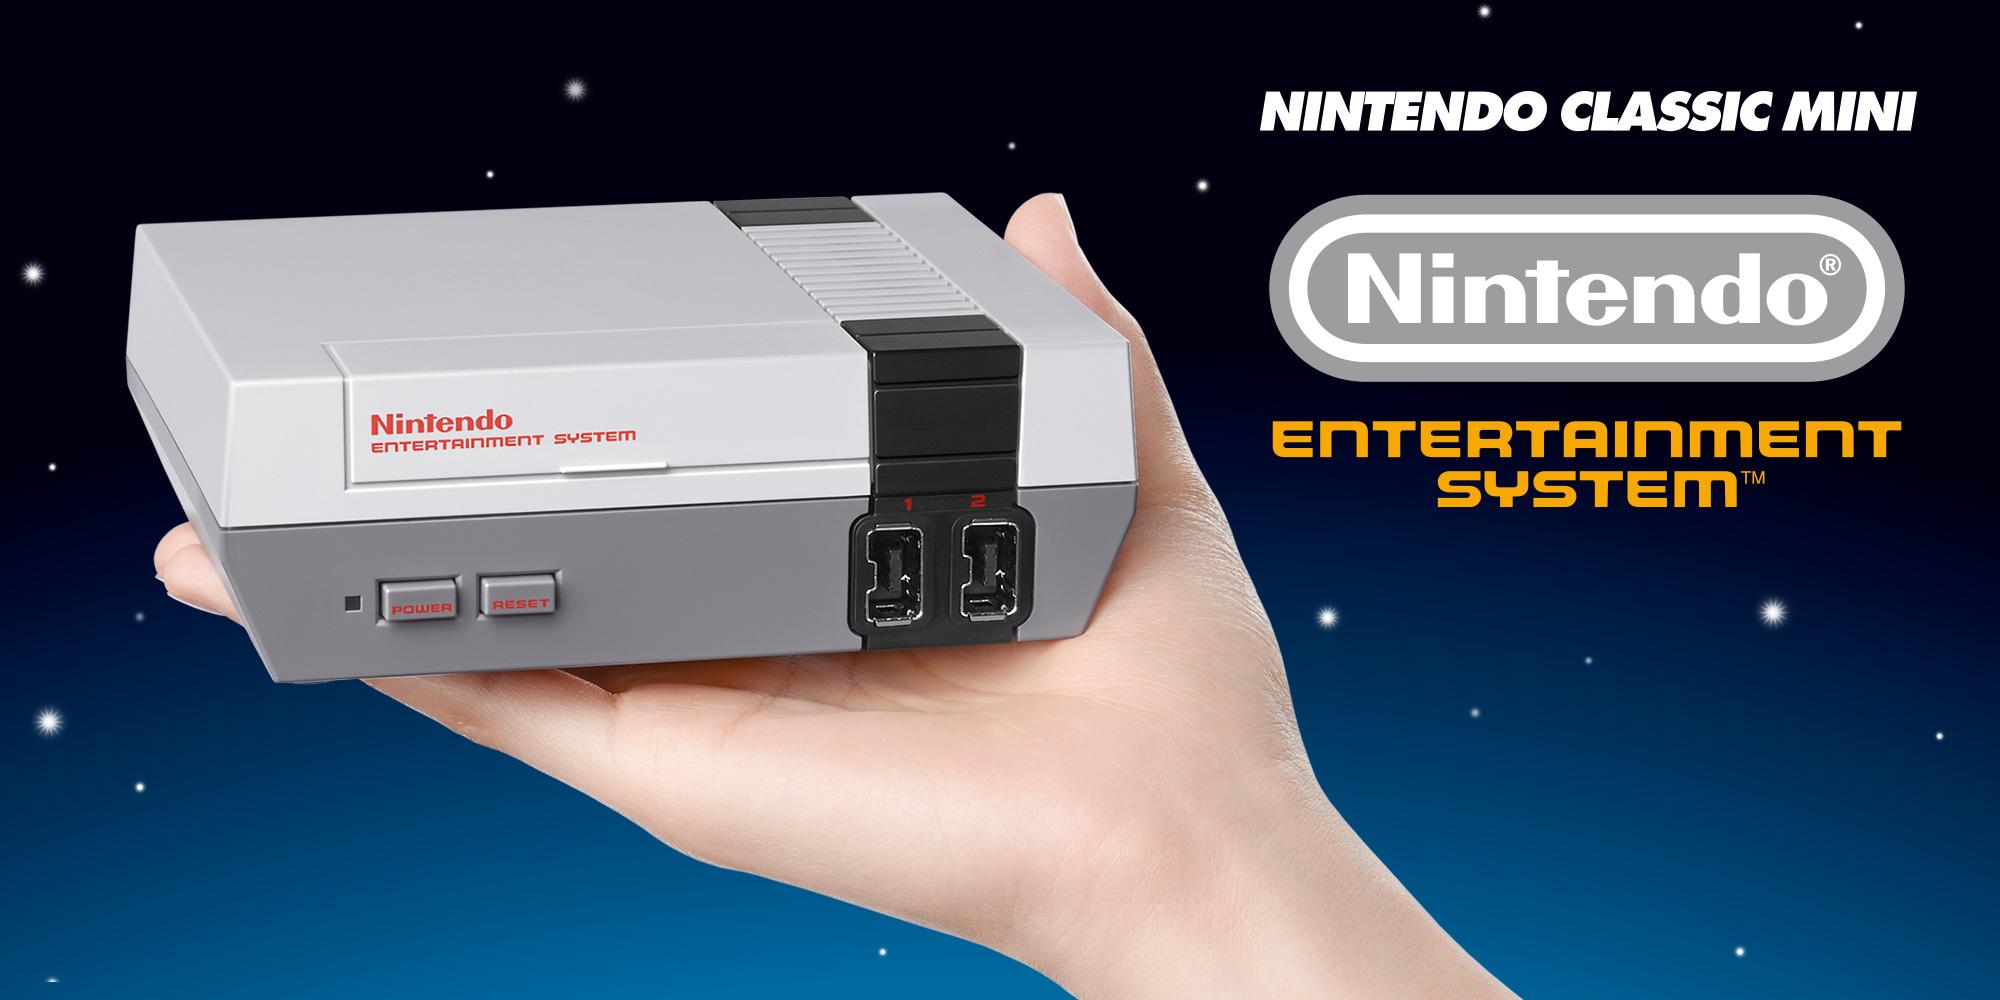 nintendo mini NES Classic Edition (2)